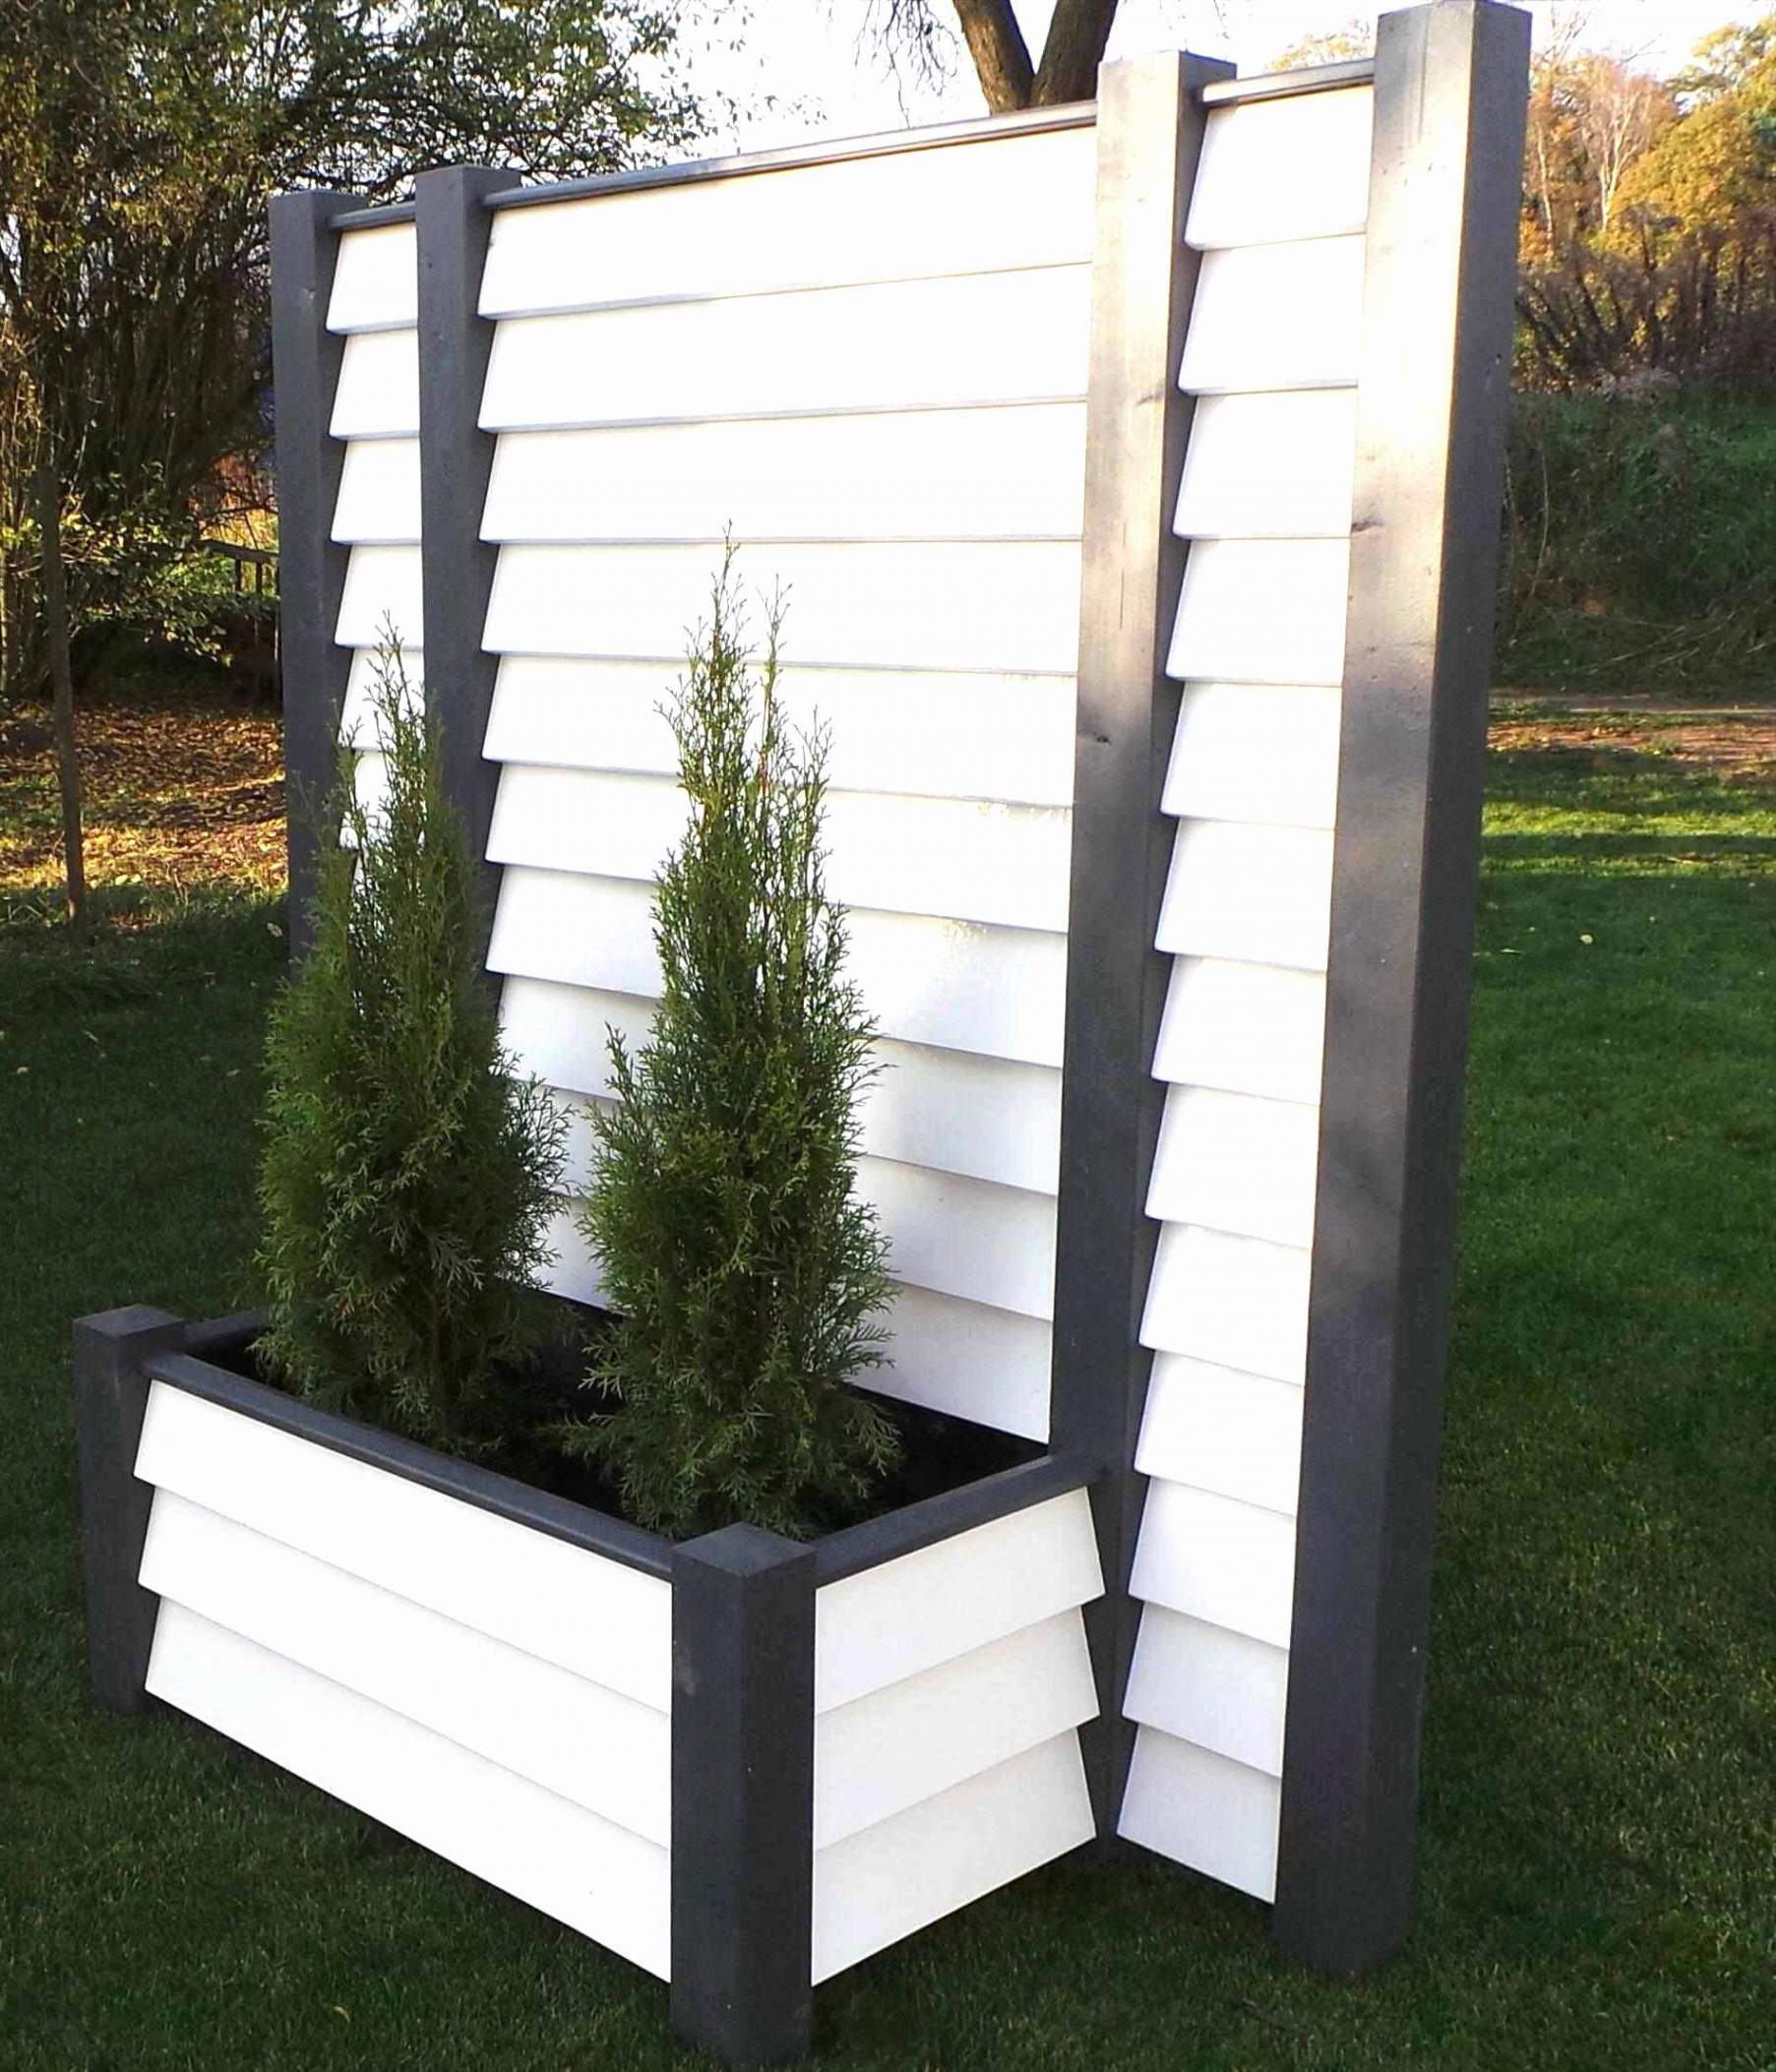 38 Genial Schallschutz Garten Selber Bauen Inspirierend Garten